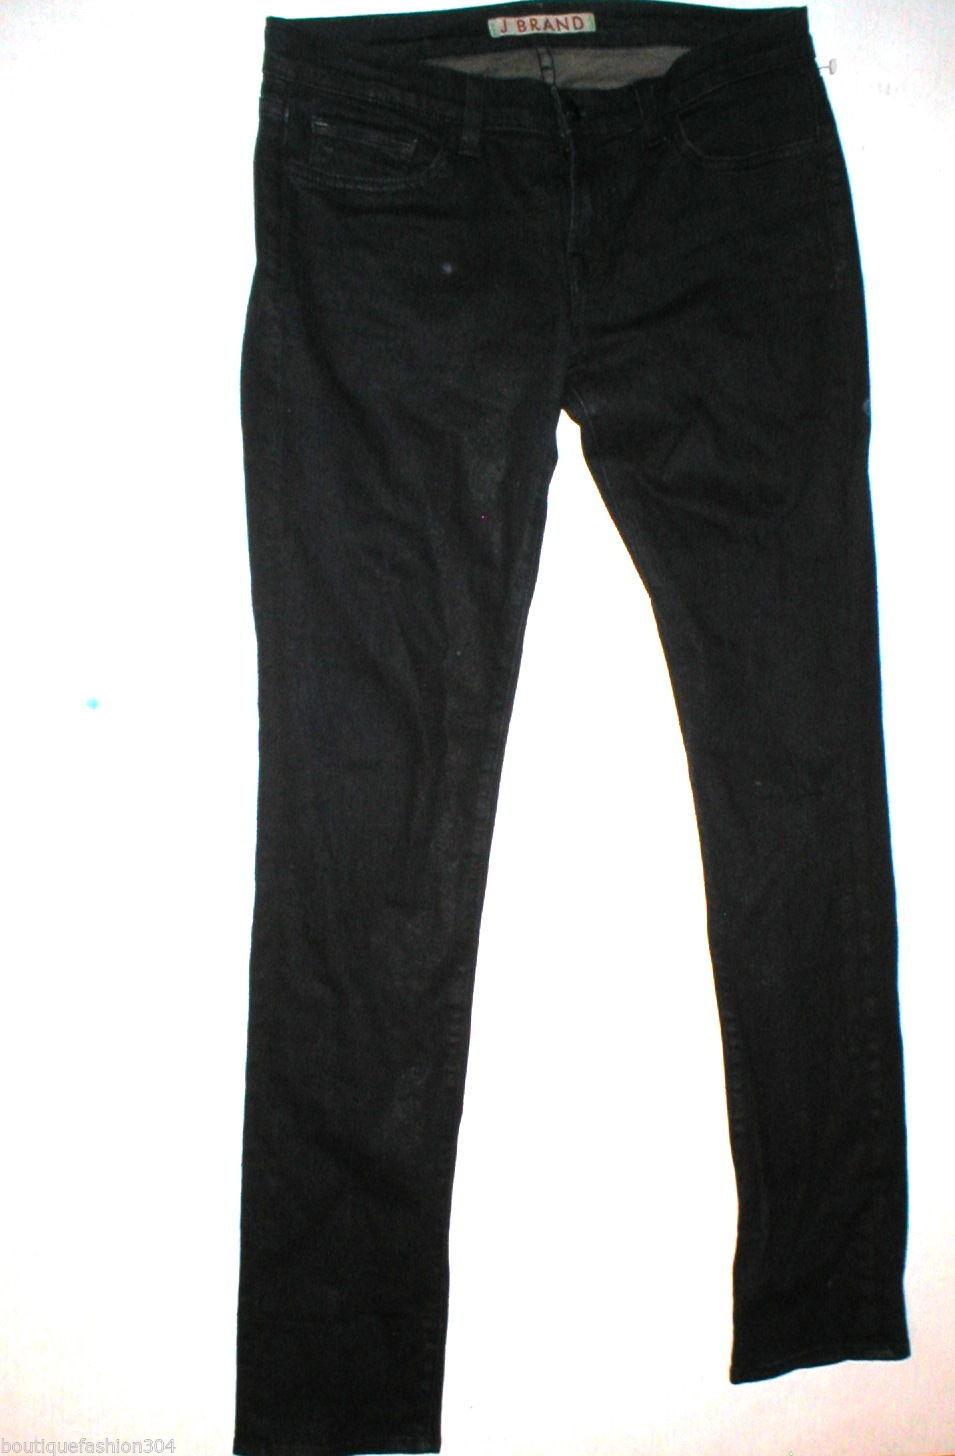 New J Brand Jeans Pencil Leg 29 30 X 32 Skinny Stretch Dark Womens Venom Coated